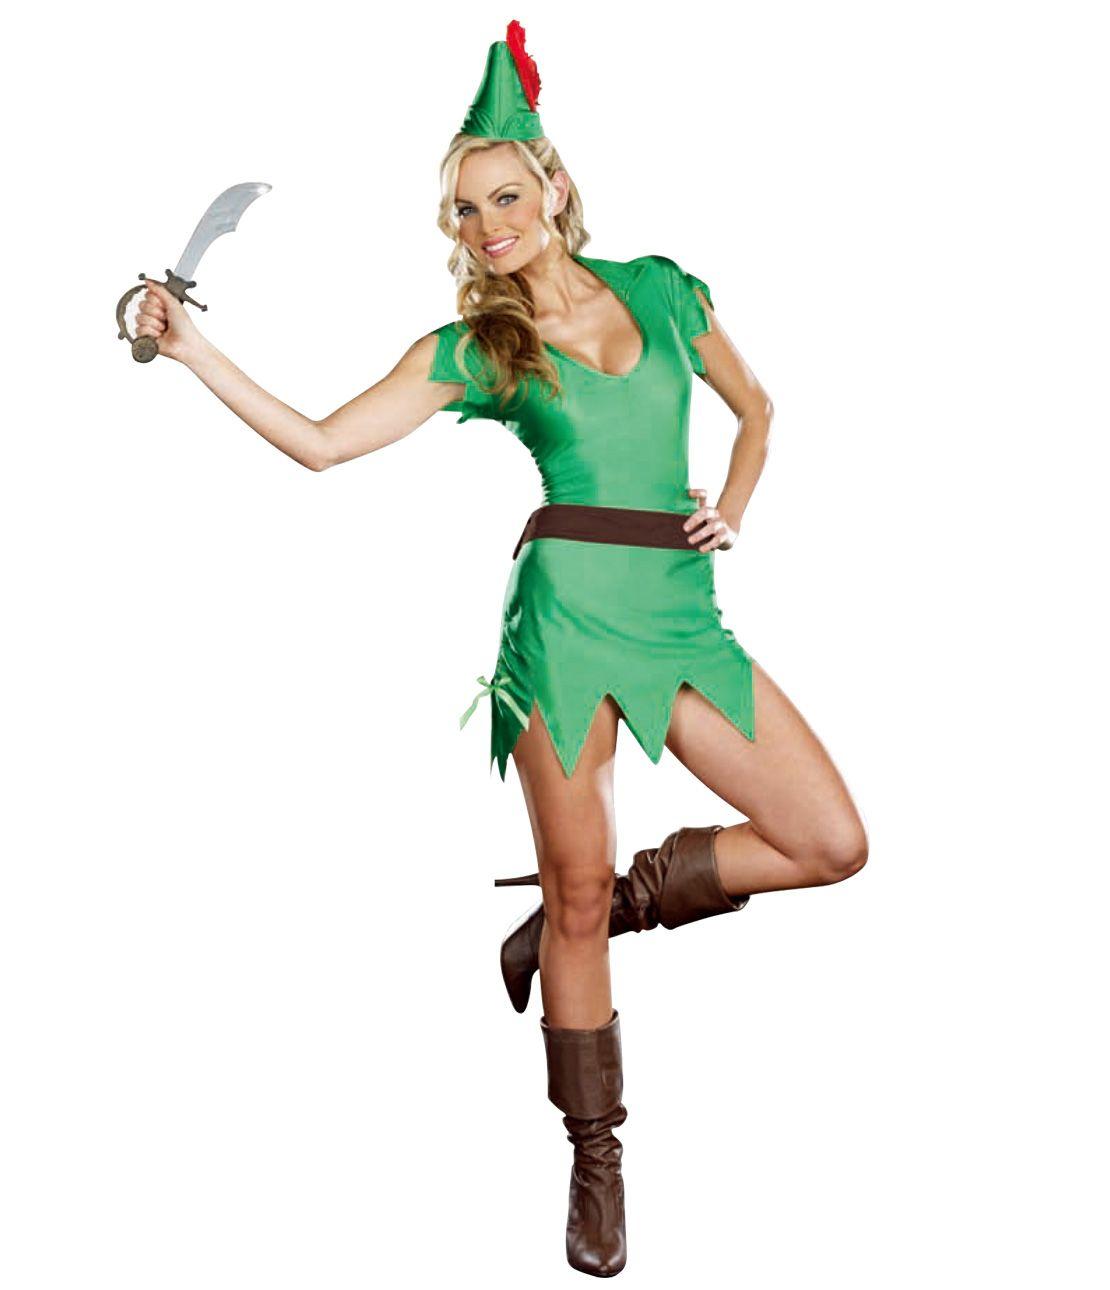 Adventure Girl Costume Set (Dress, Hat, Belt, Fake Sword)